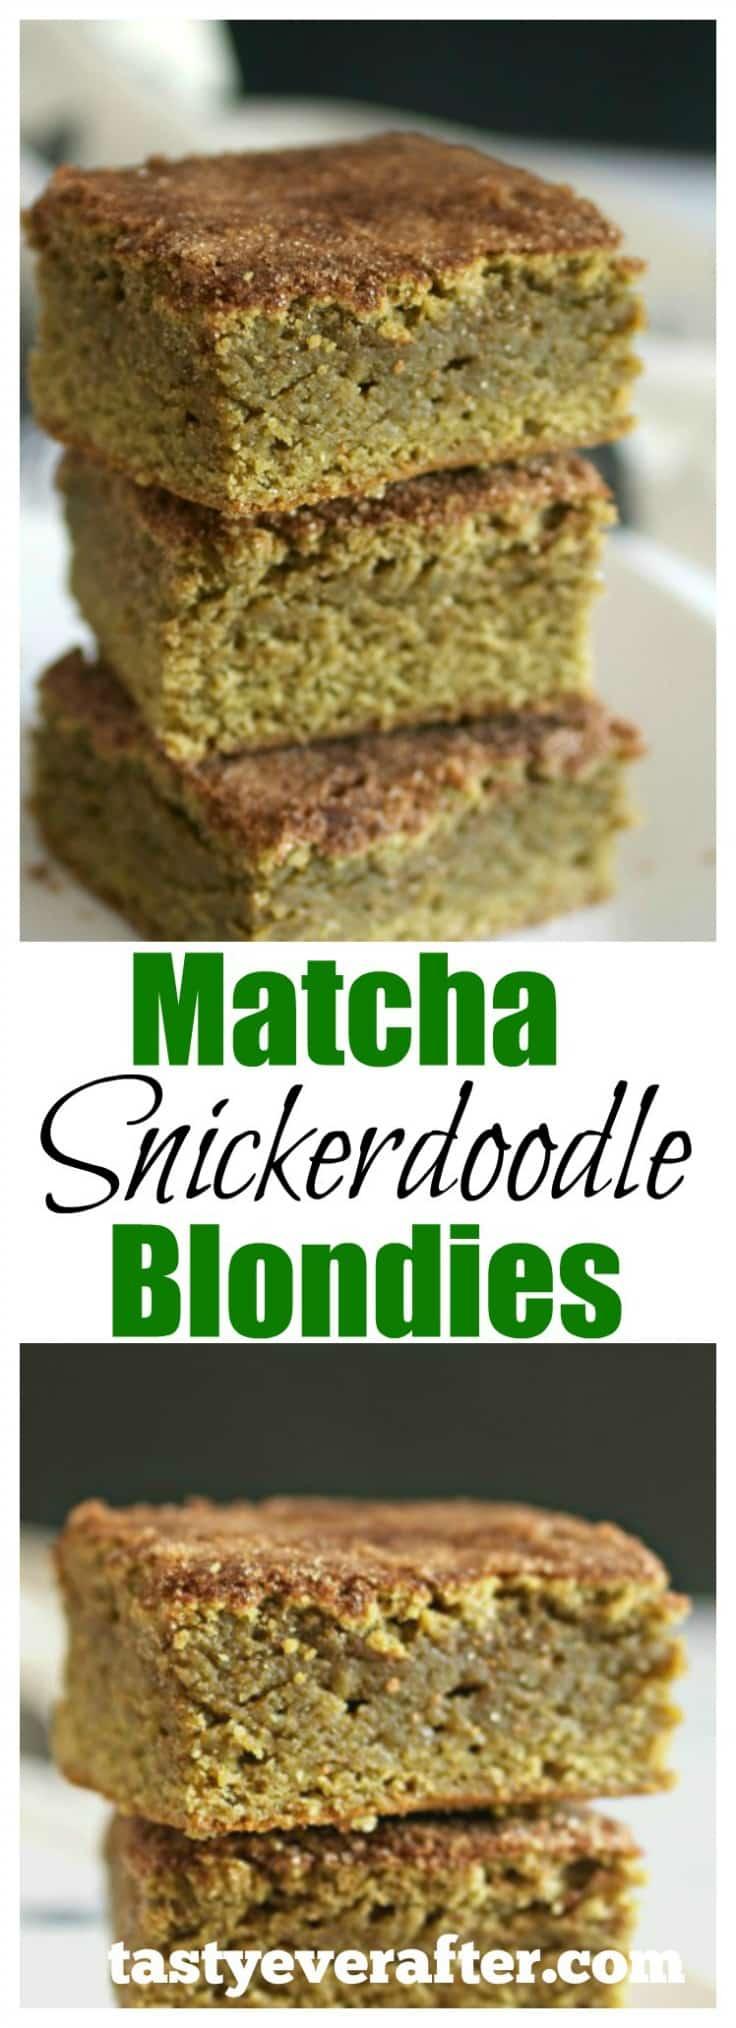 Matcha Snickerdoodle Blondies